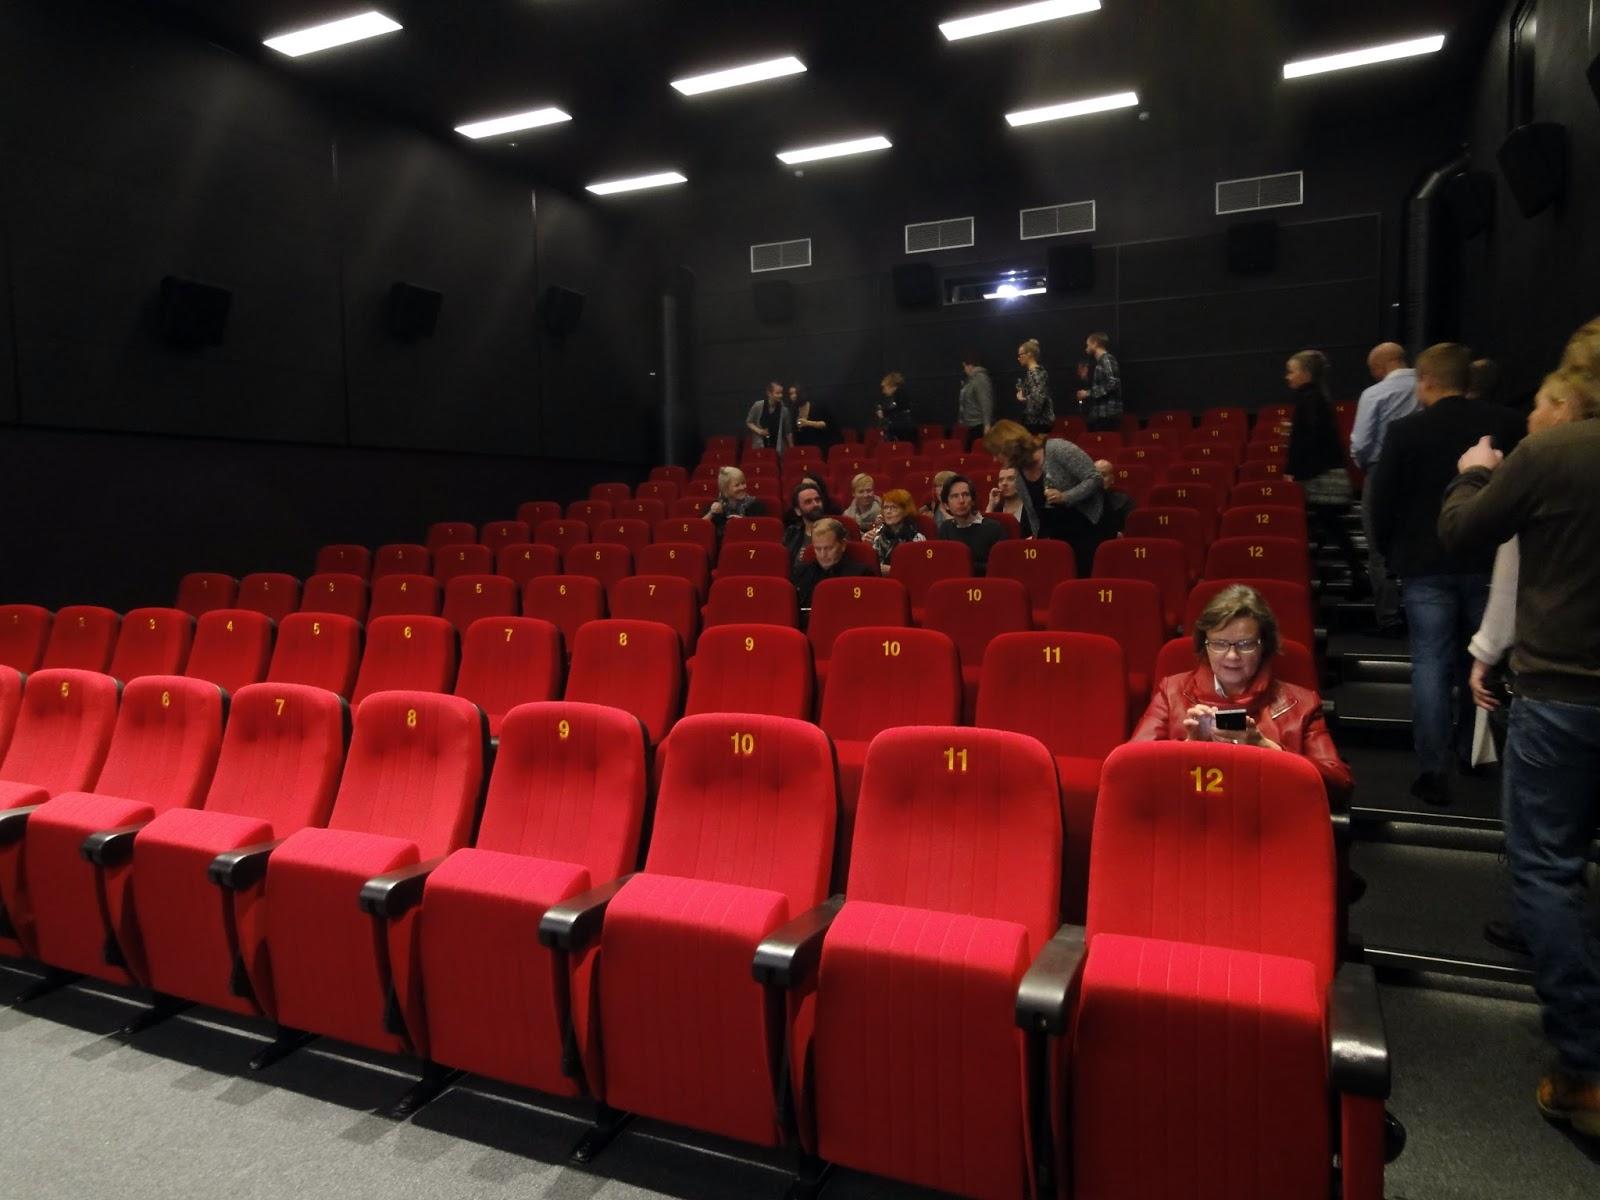 Kino Korjaamo